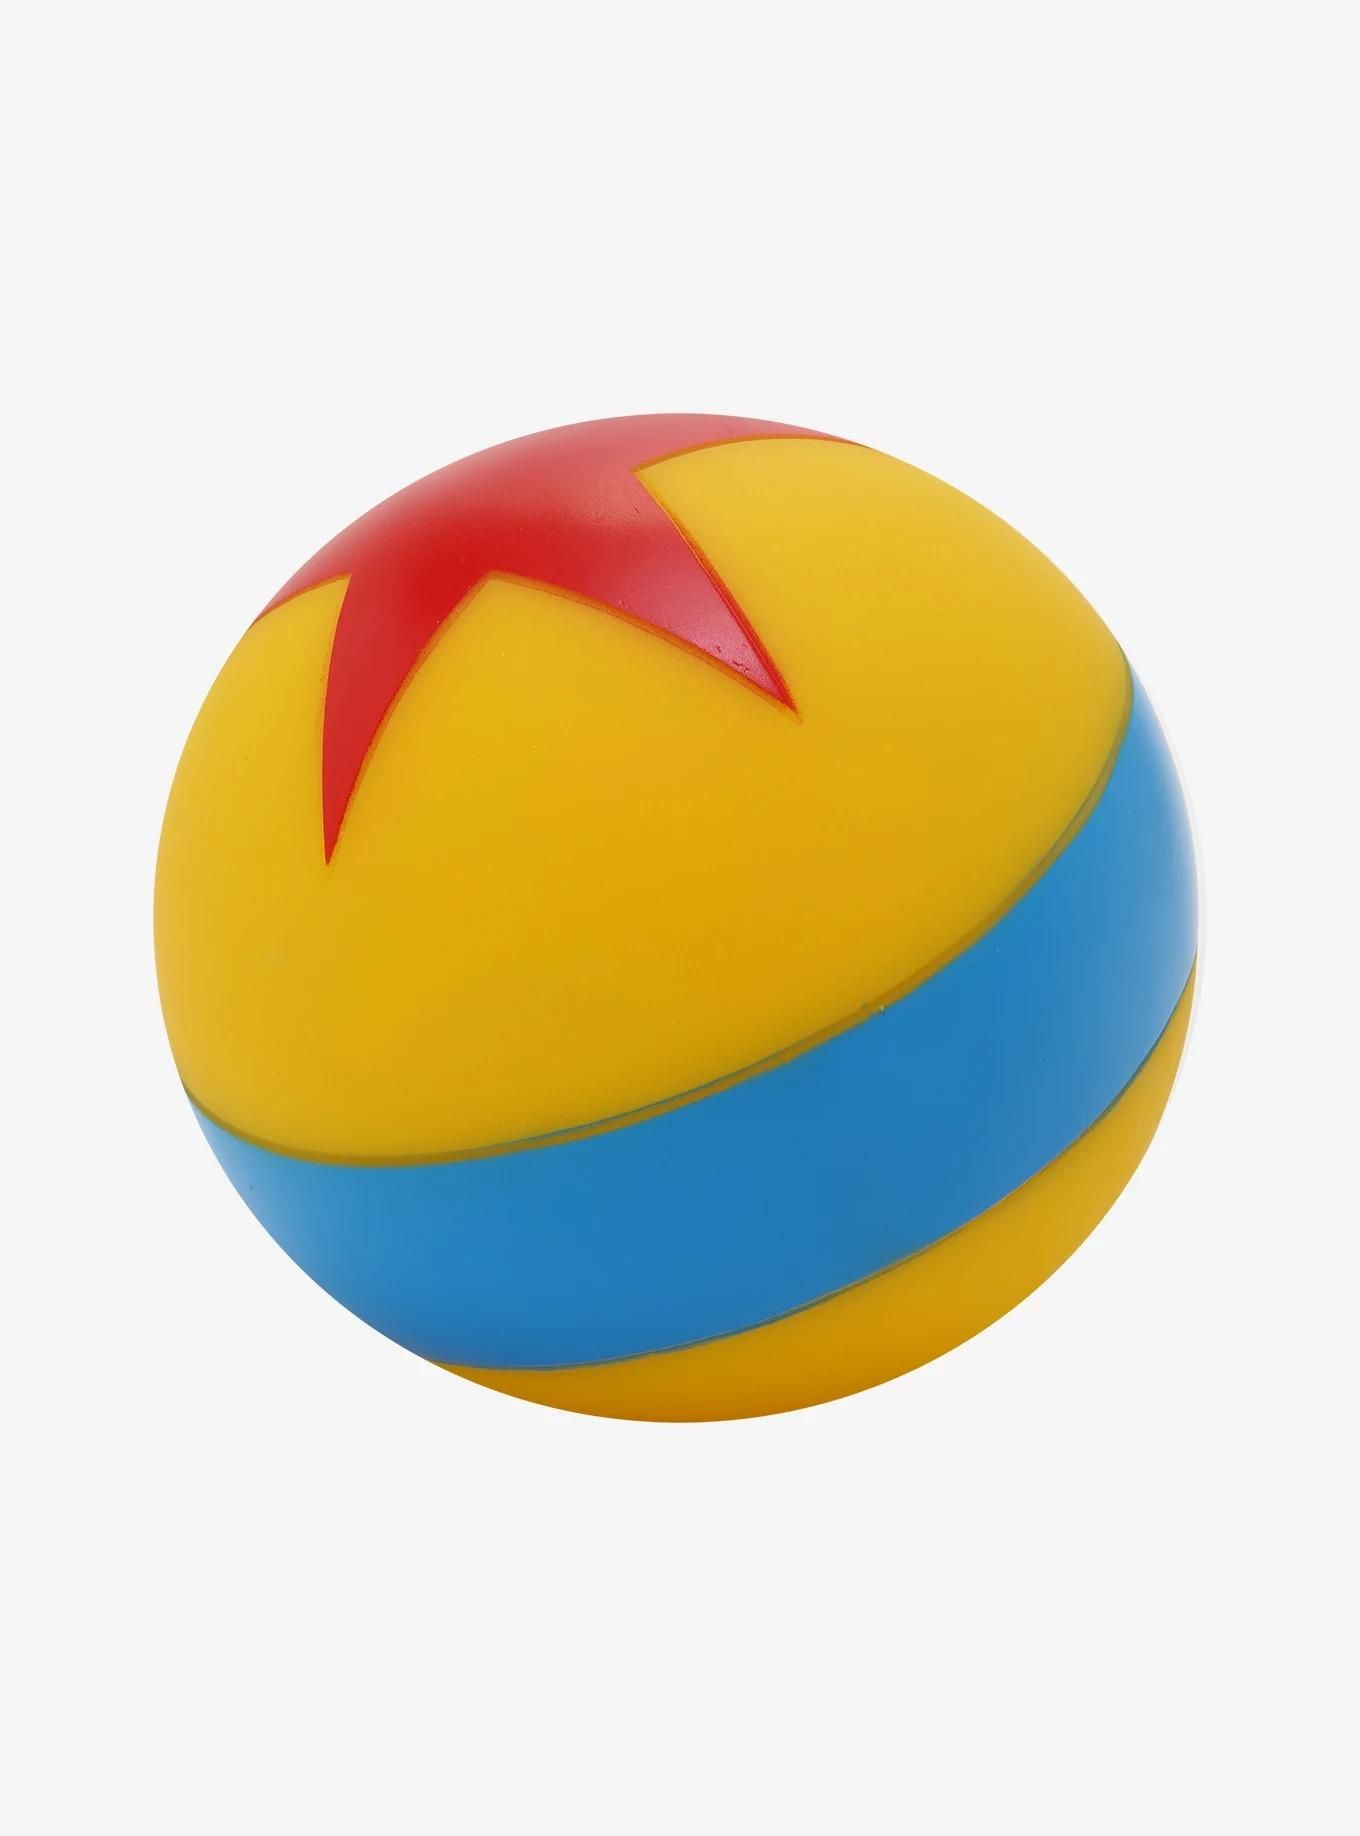 Disney Pixar Toy Story Luxo Ball Mood Light In 2020 Pixar Toys Pixar Disney Pixar